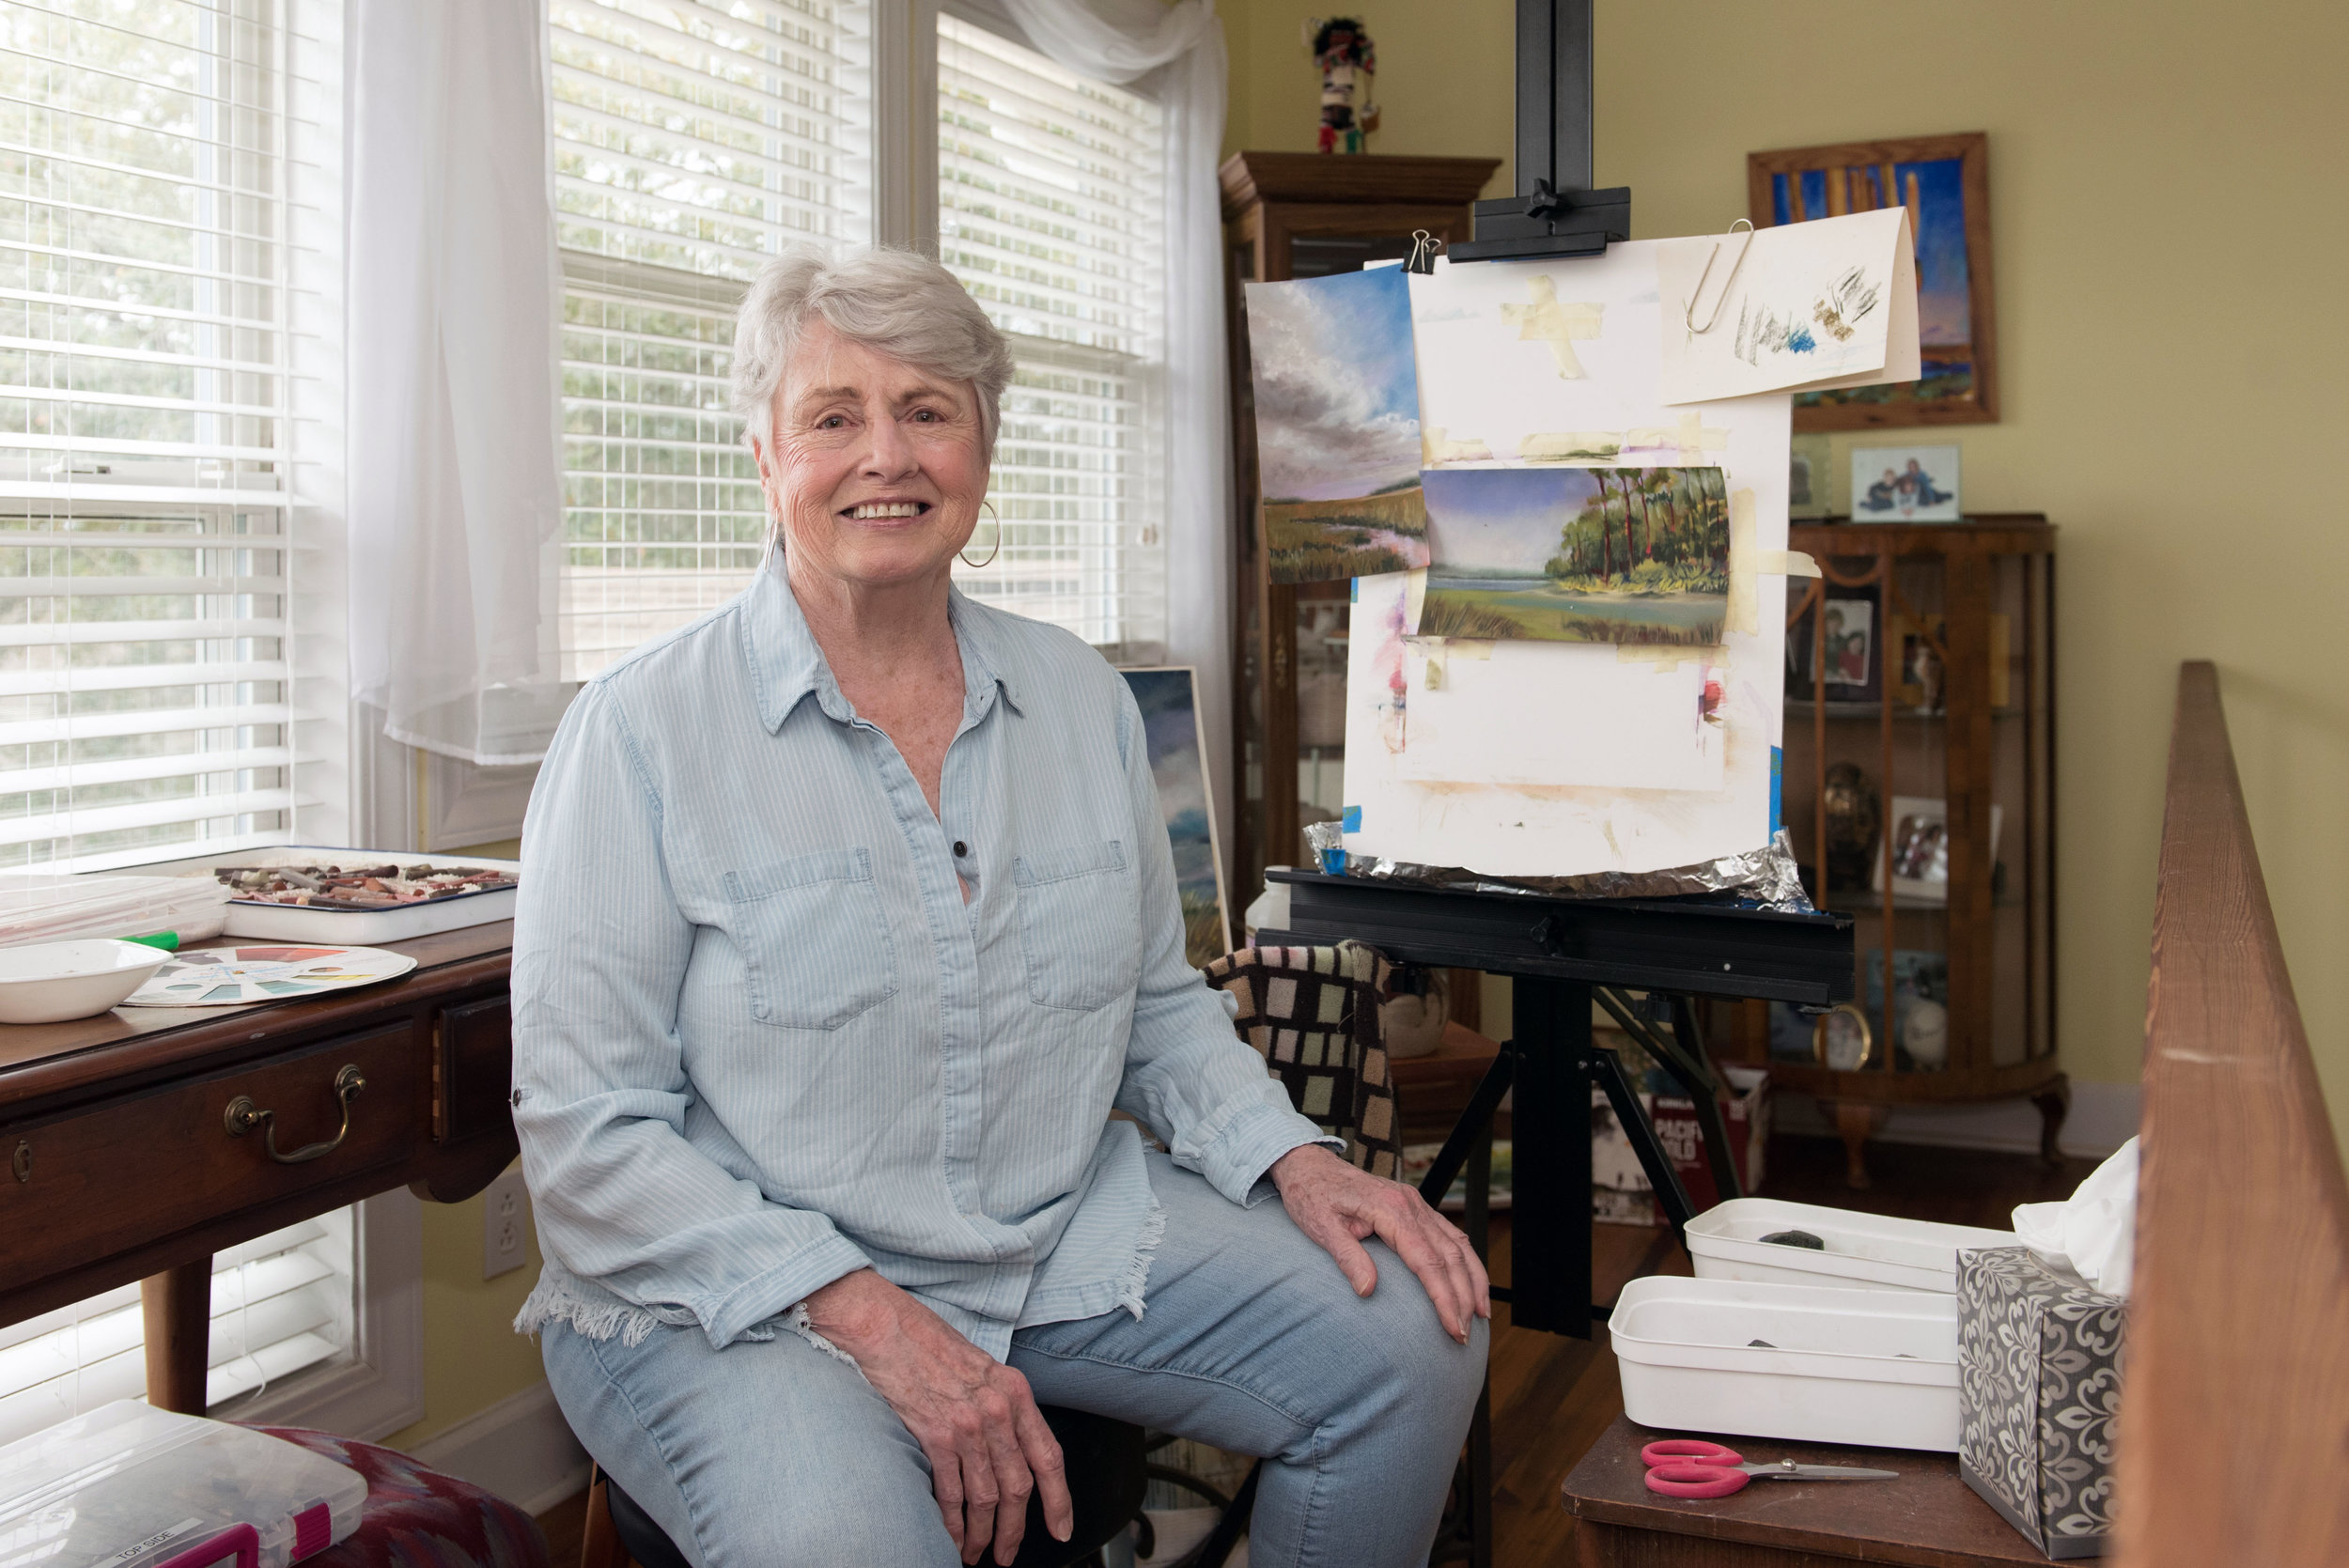 Artist Bonnie Lee in her home studio.